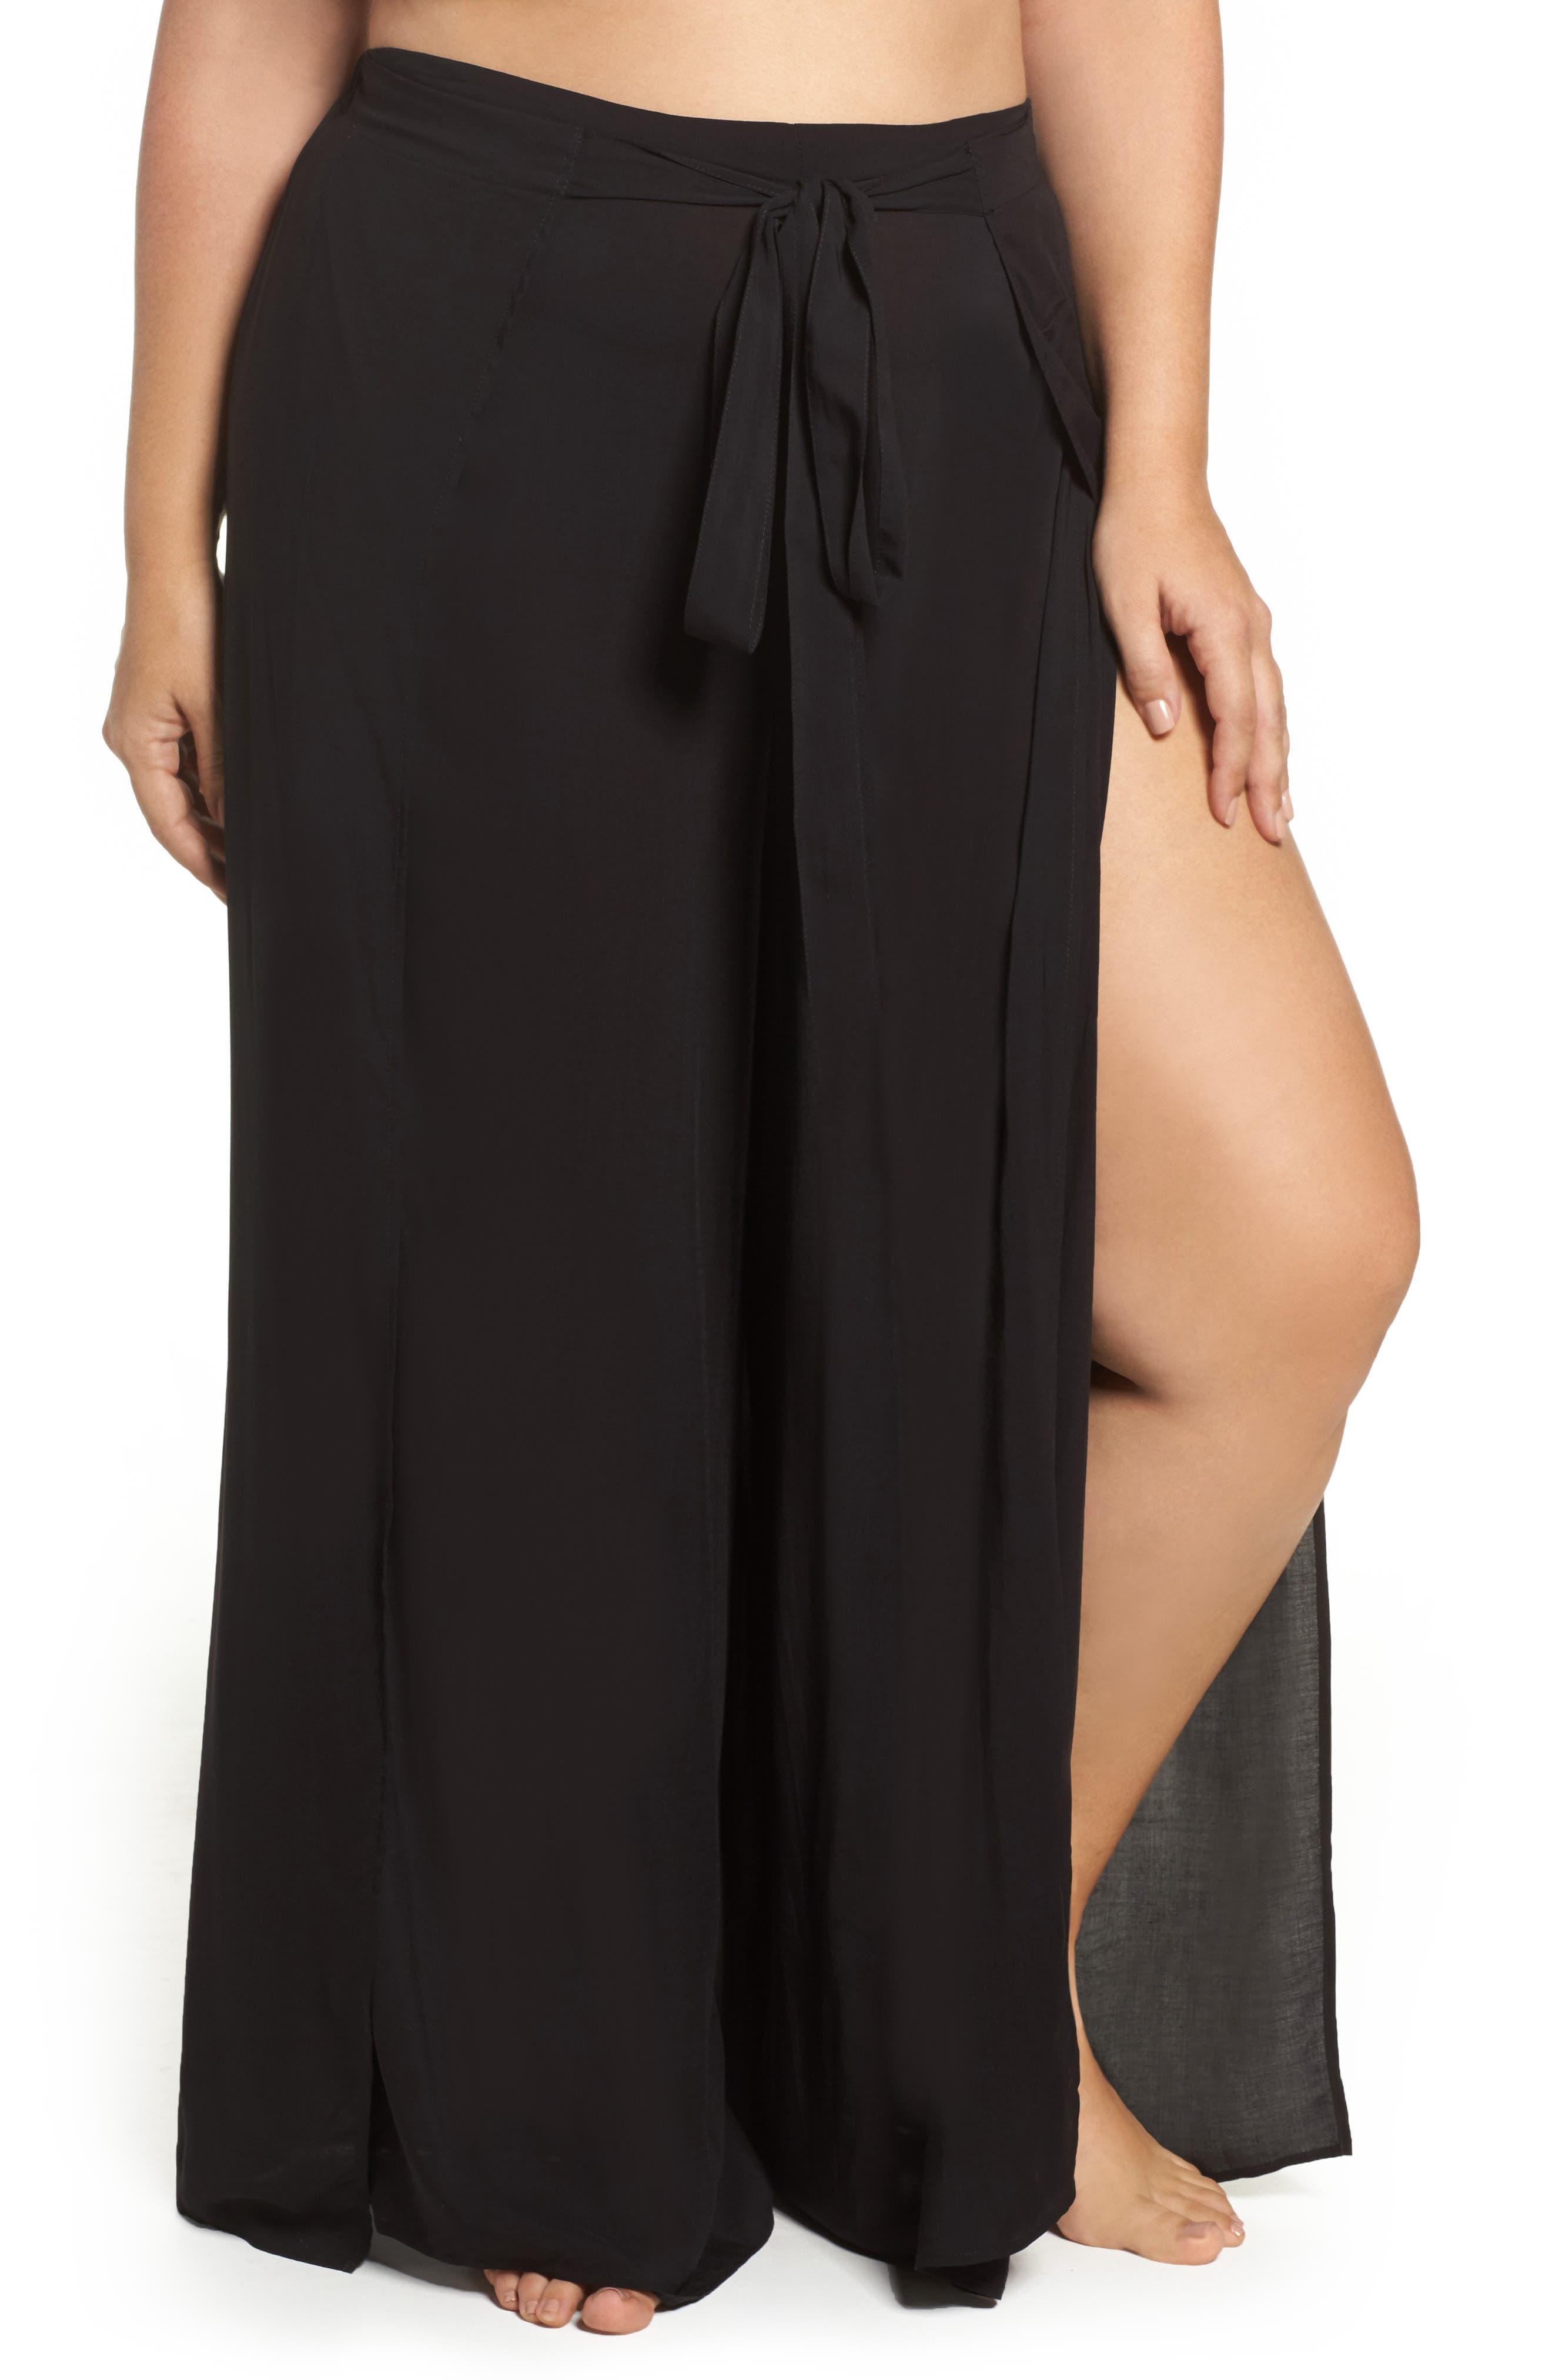 Alternate Image 1 Selected - Elan Cover-Up Flyaway Pants (Plus Size)